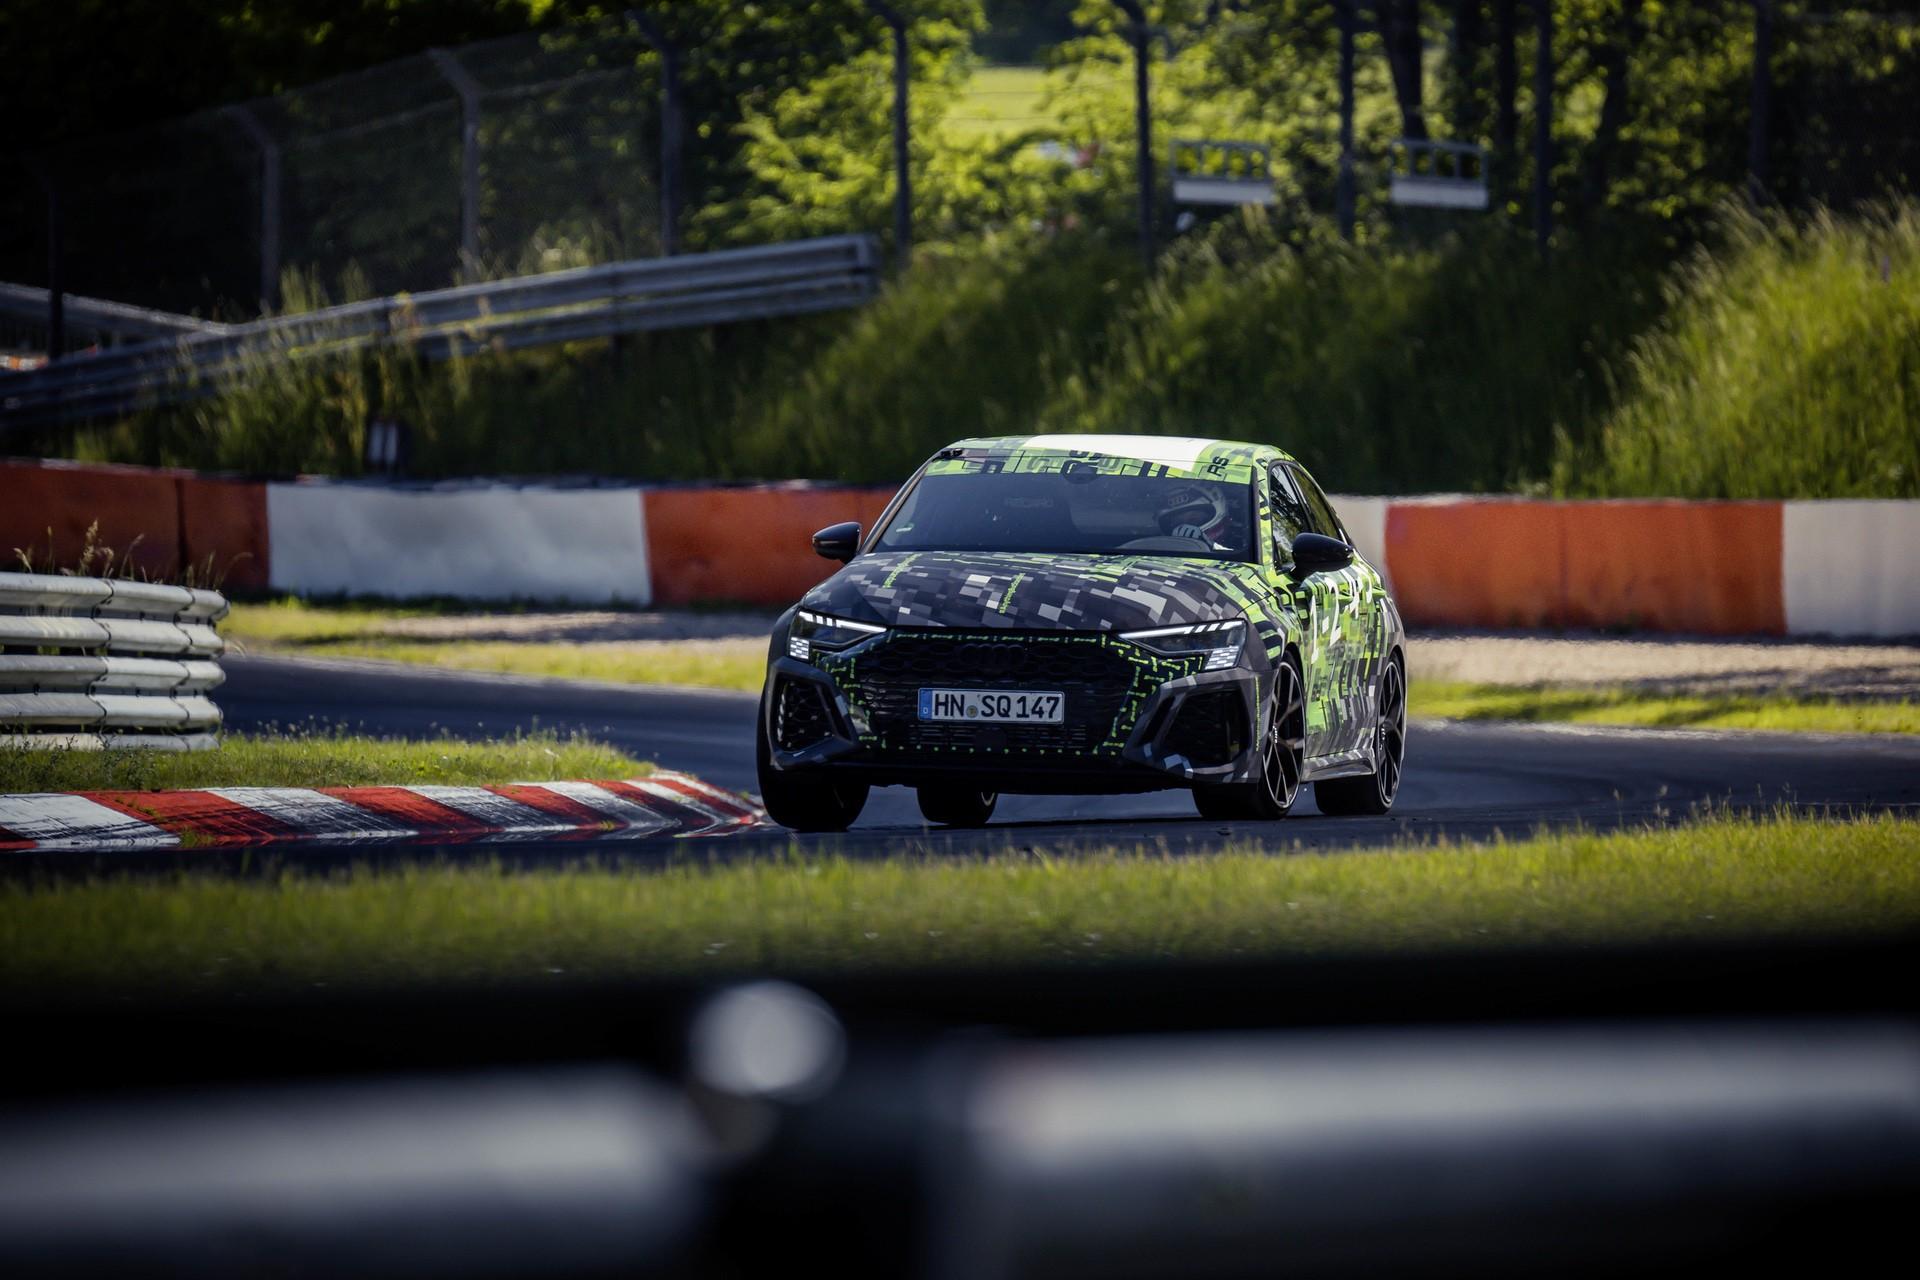 Audi_RS3_Sedan_Nurburgring_lap_record-0011